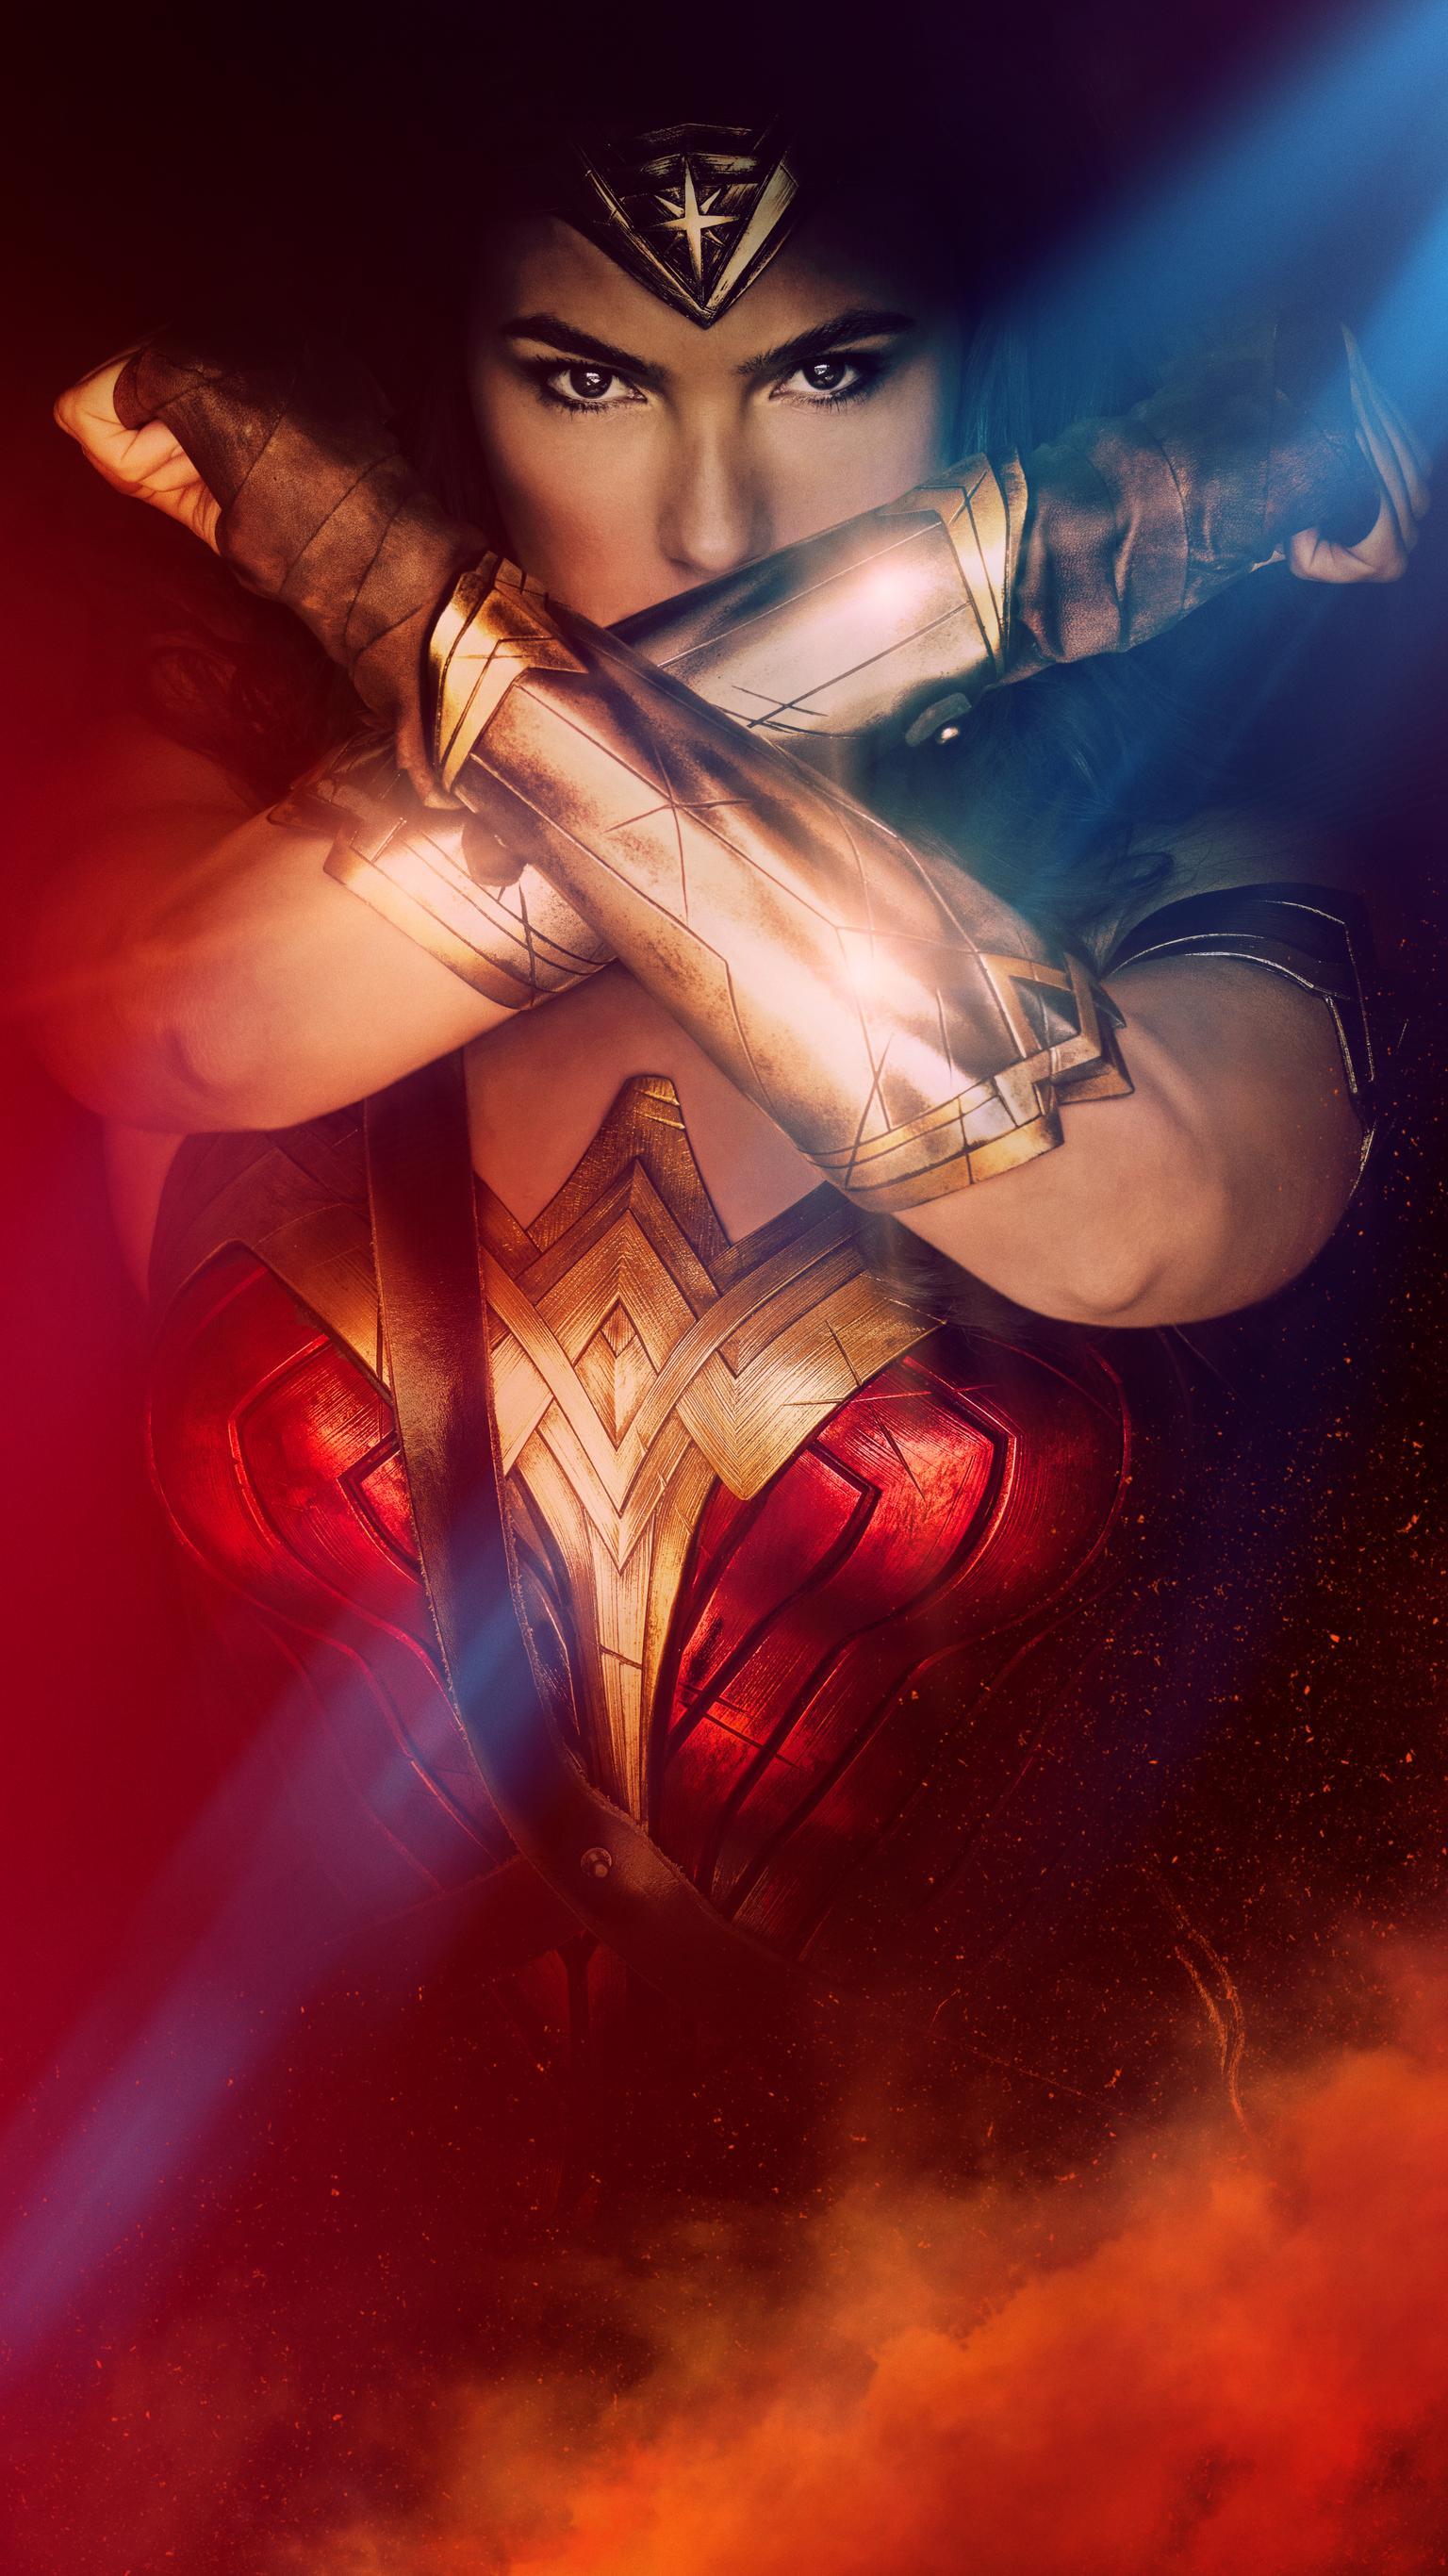 Wonder Woman Hd Wallpaper For Mobile ...